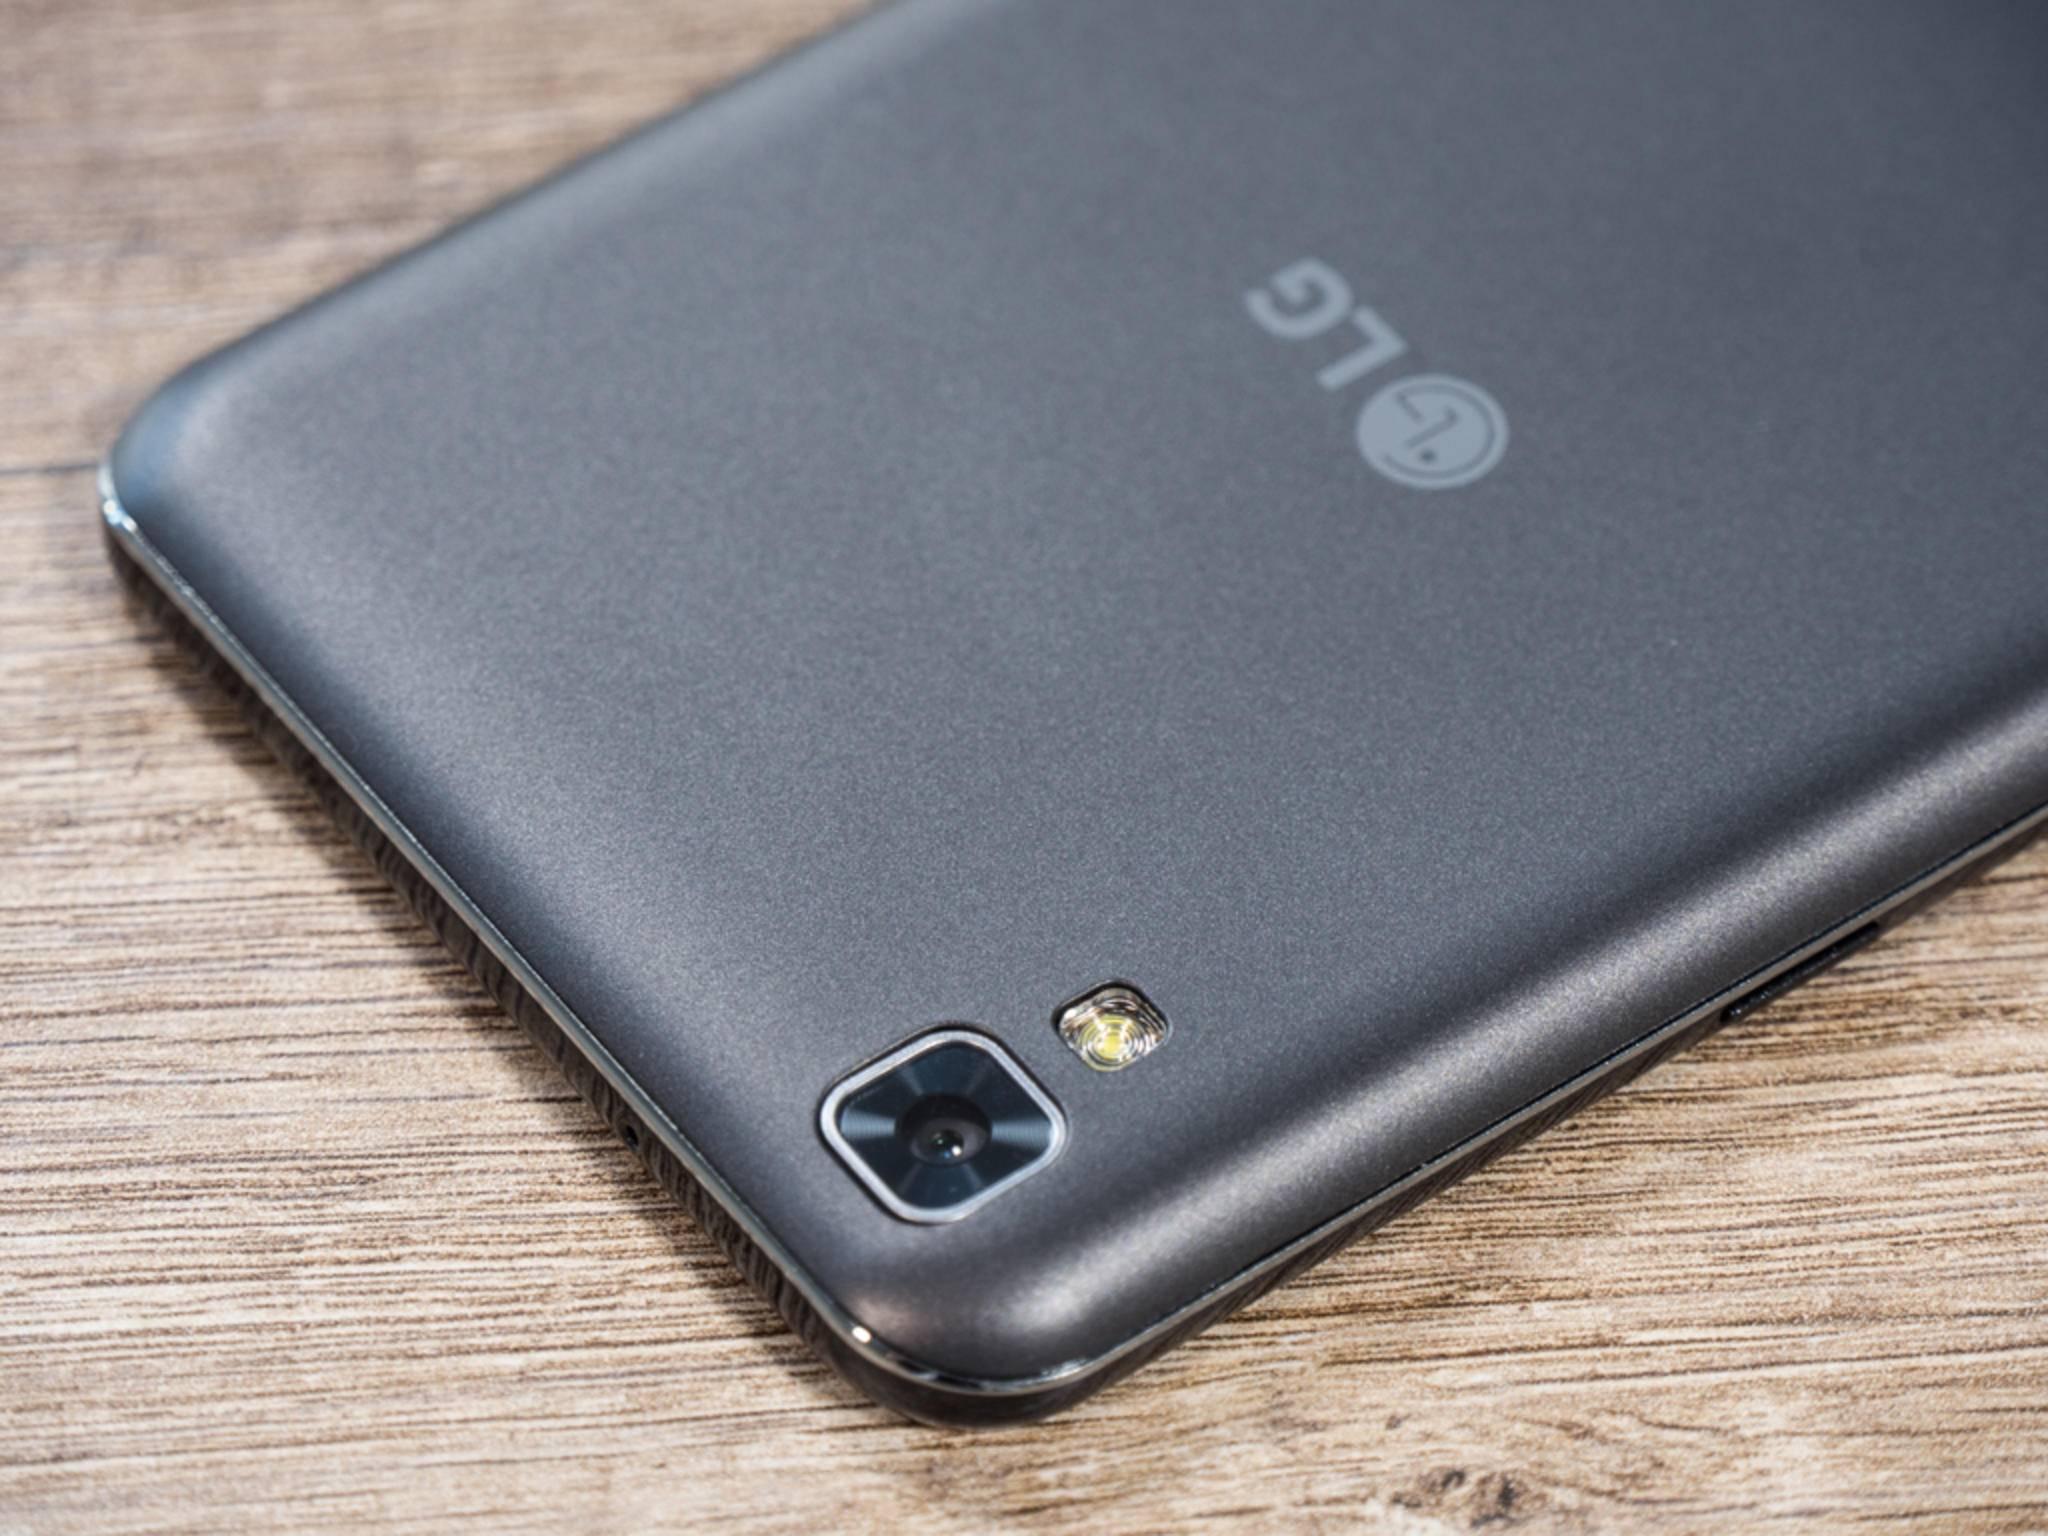 LG X Power 05.jpg